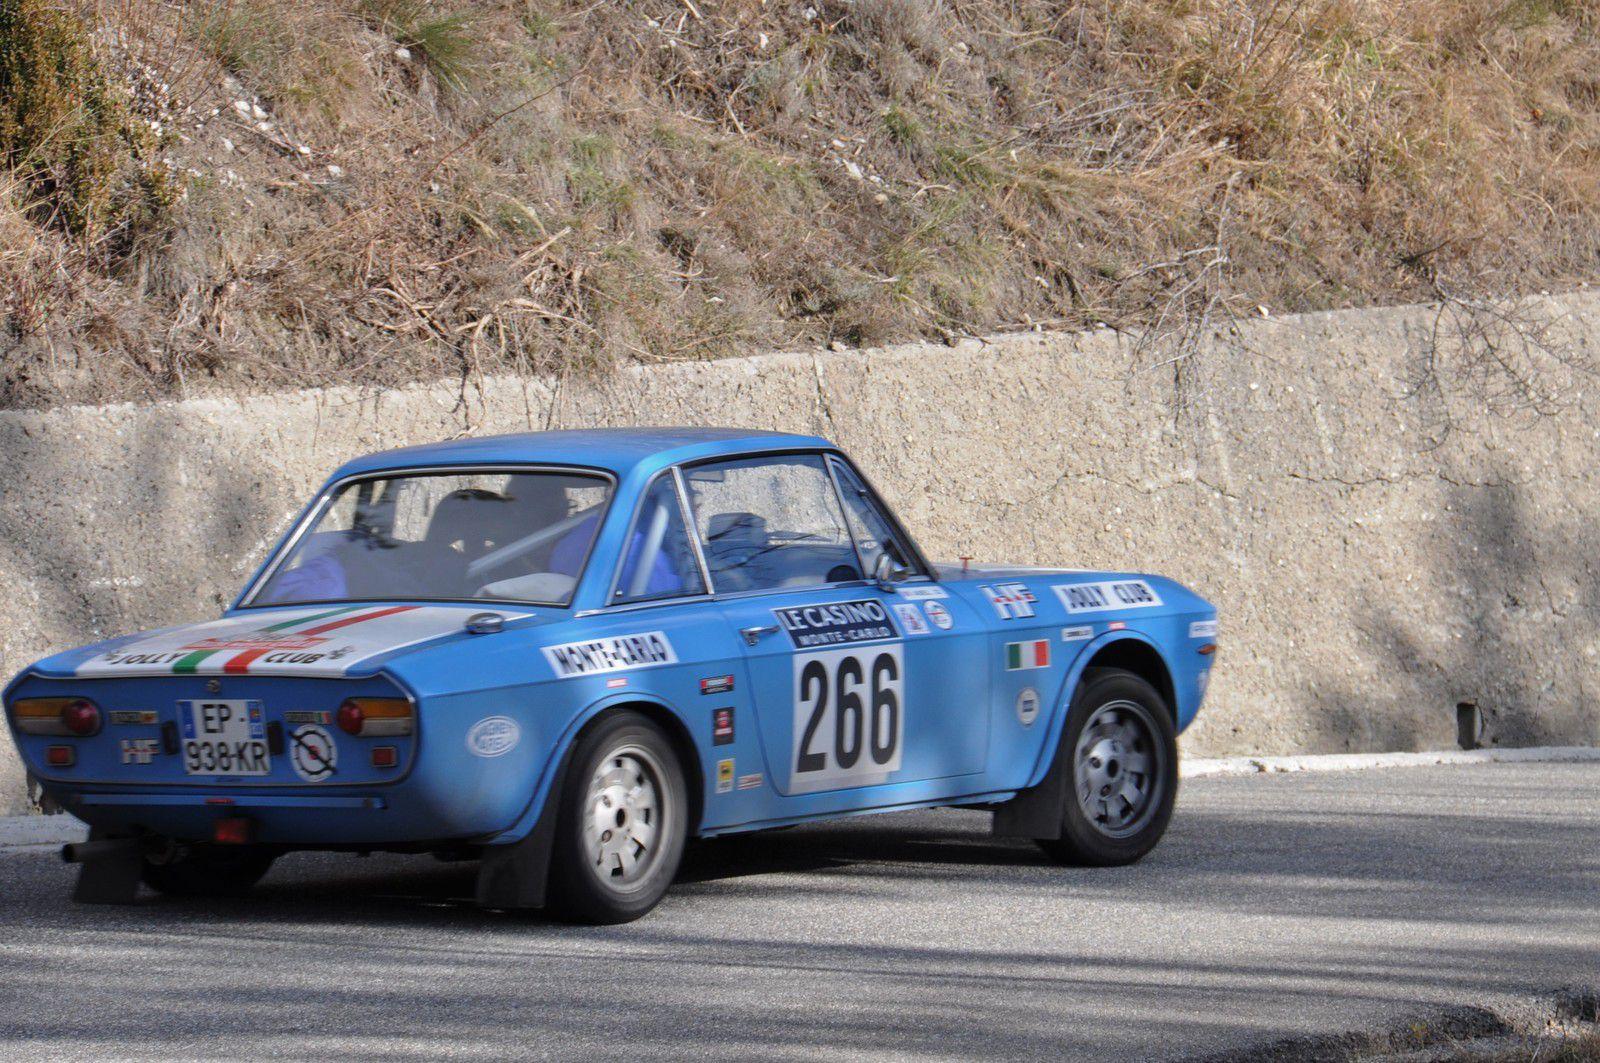 Lancia Fulvia 1,3 S 1973 ..... Photo : R.S.